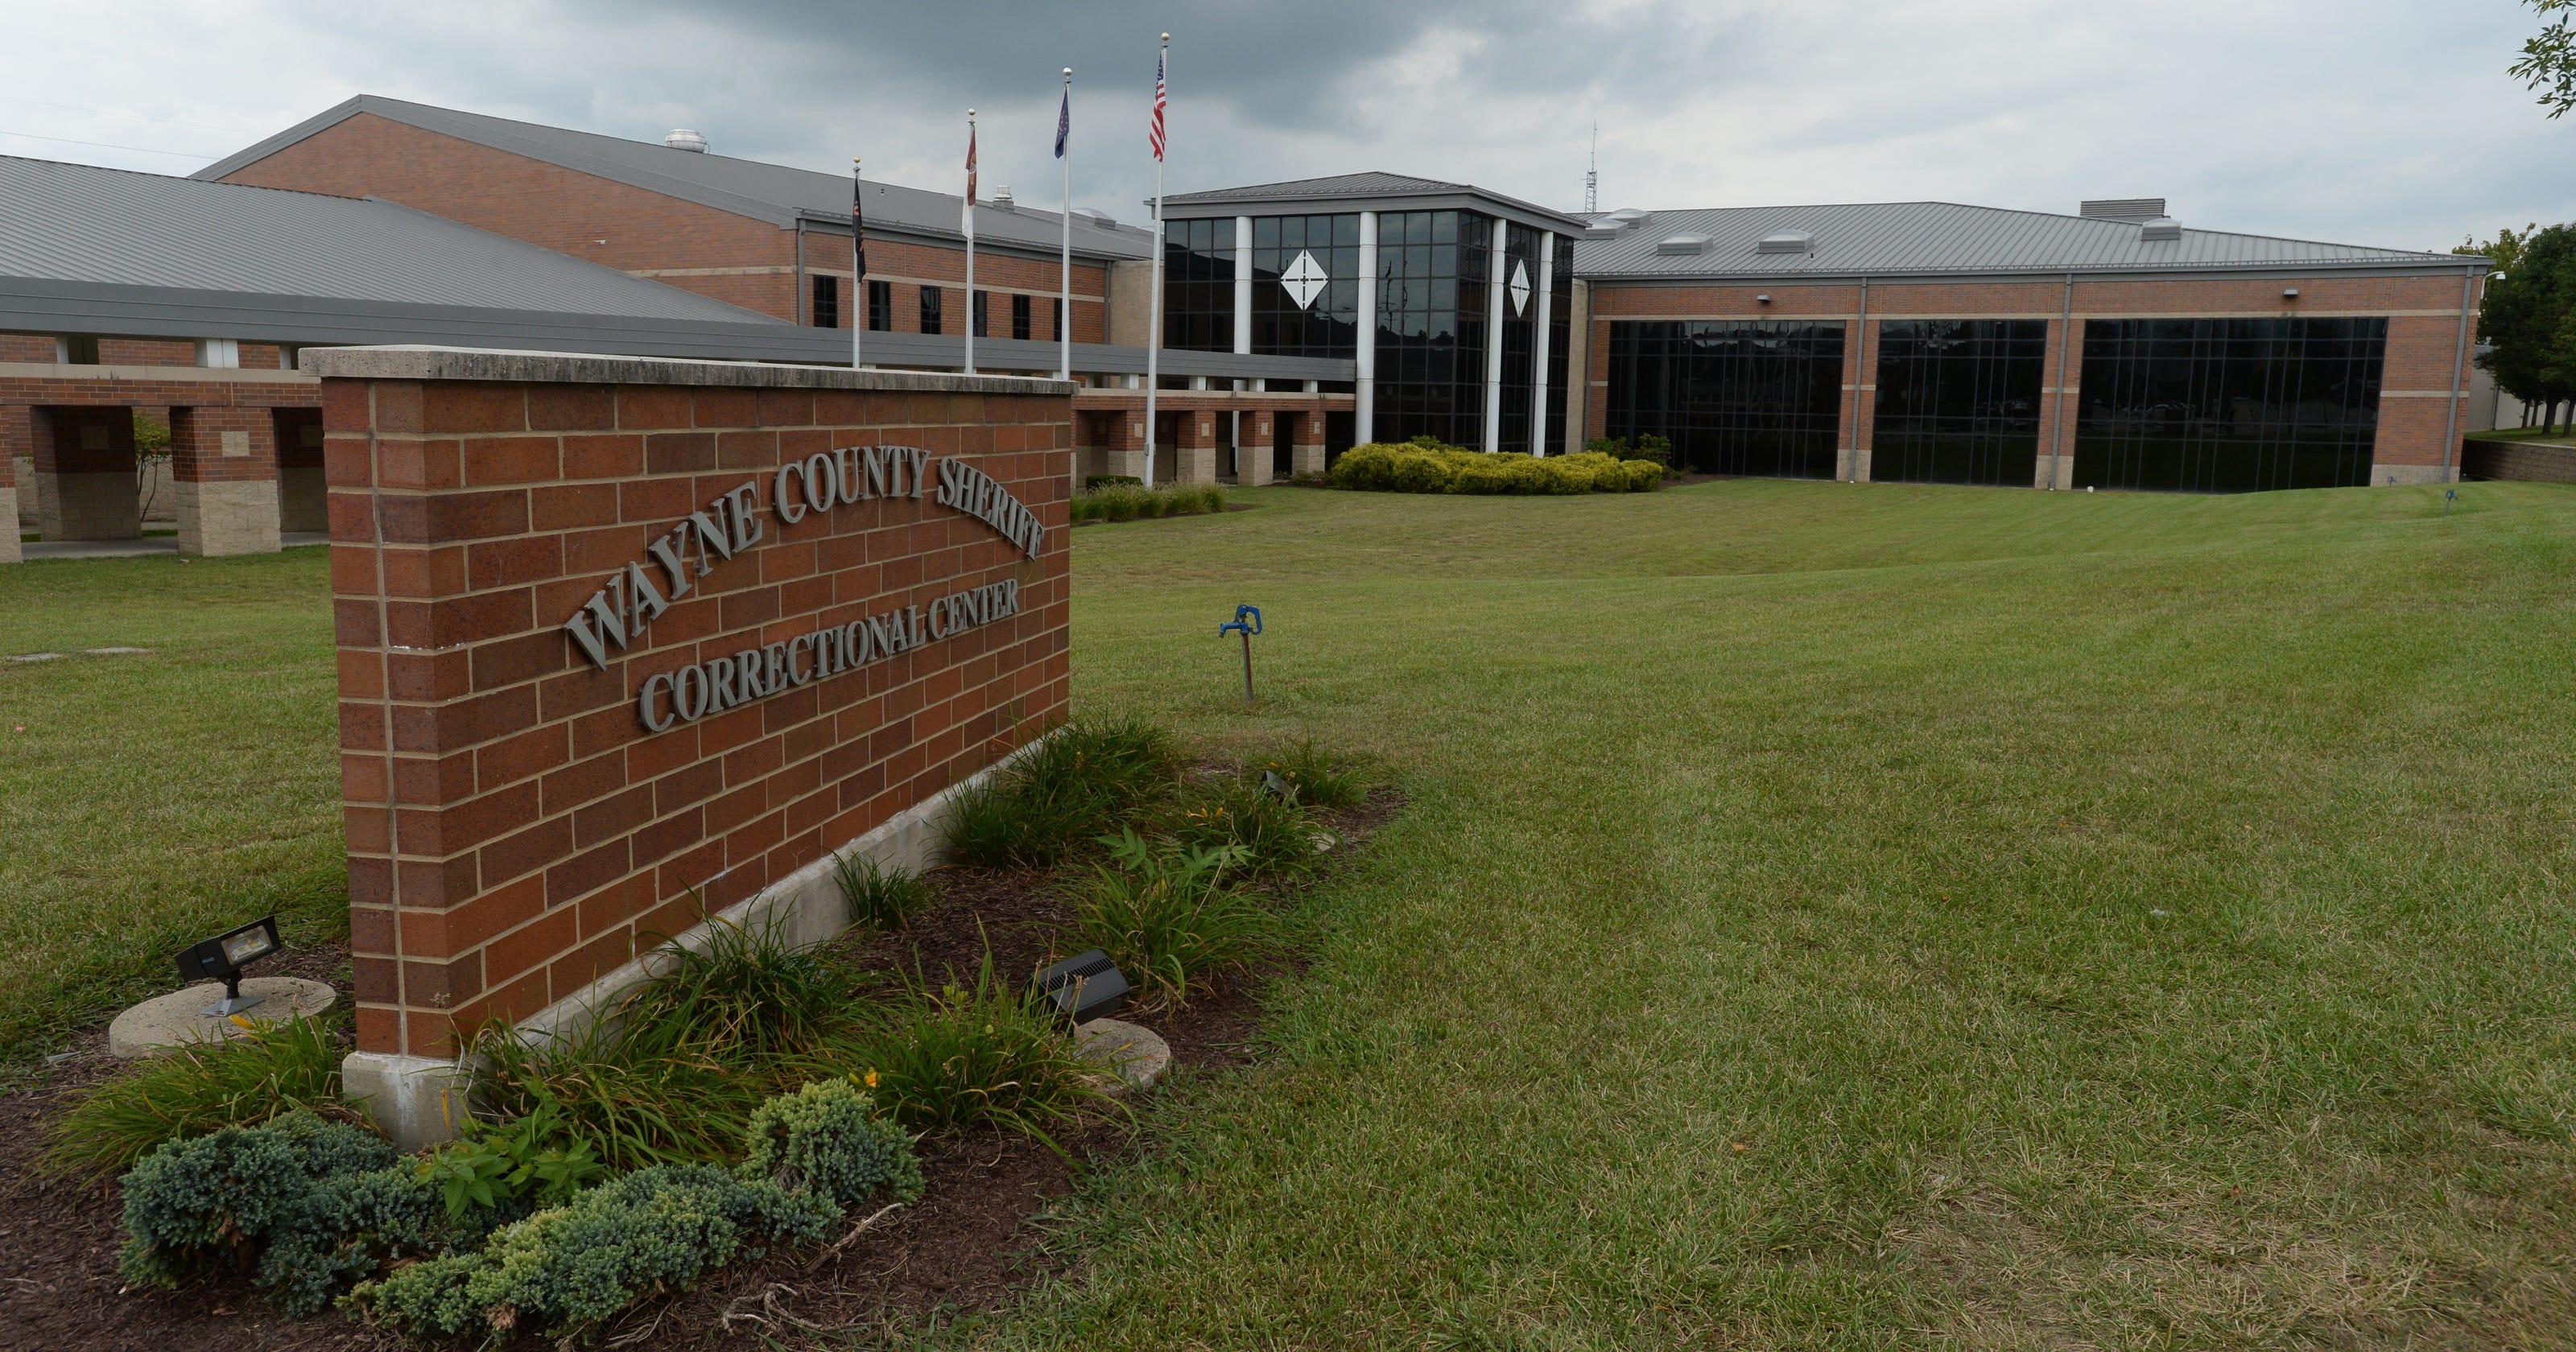 richmond ky county jail